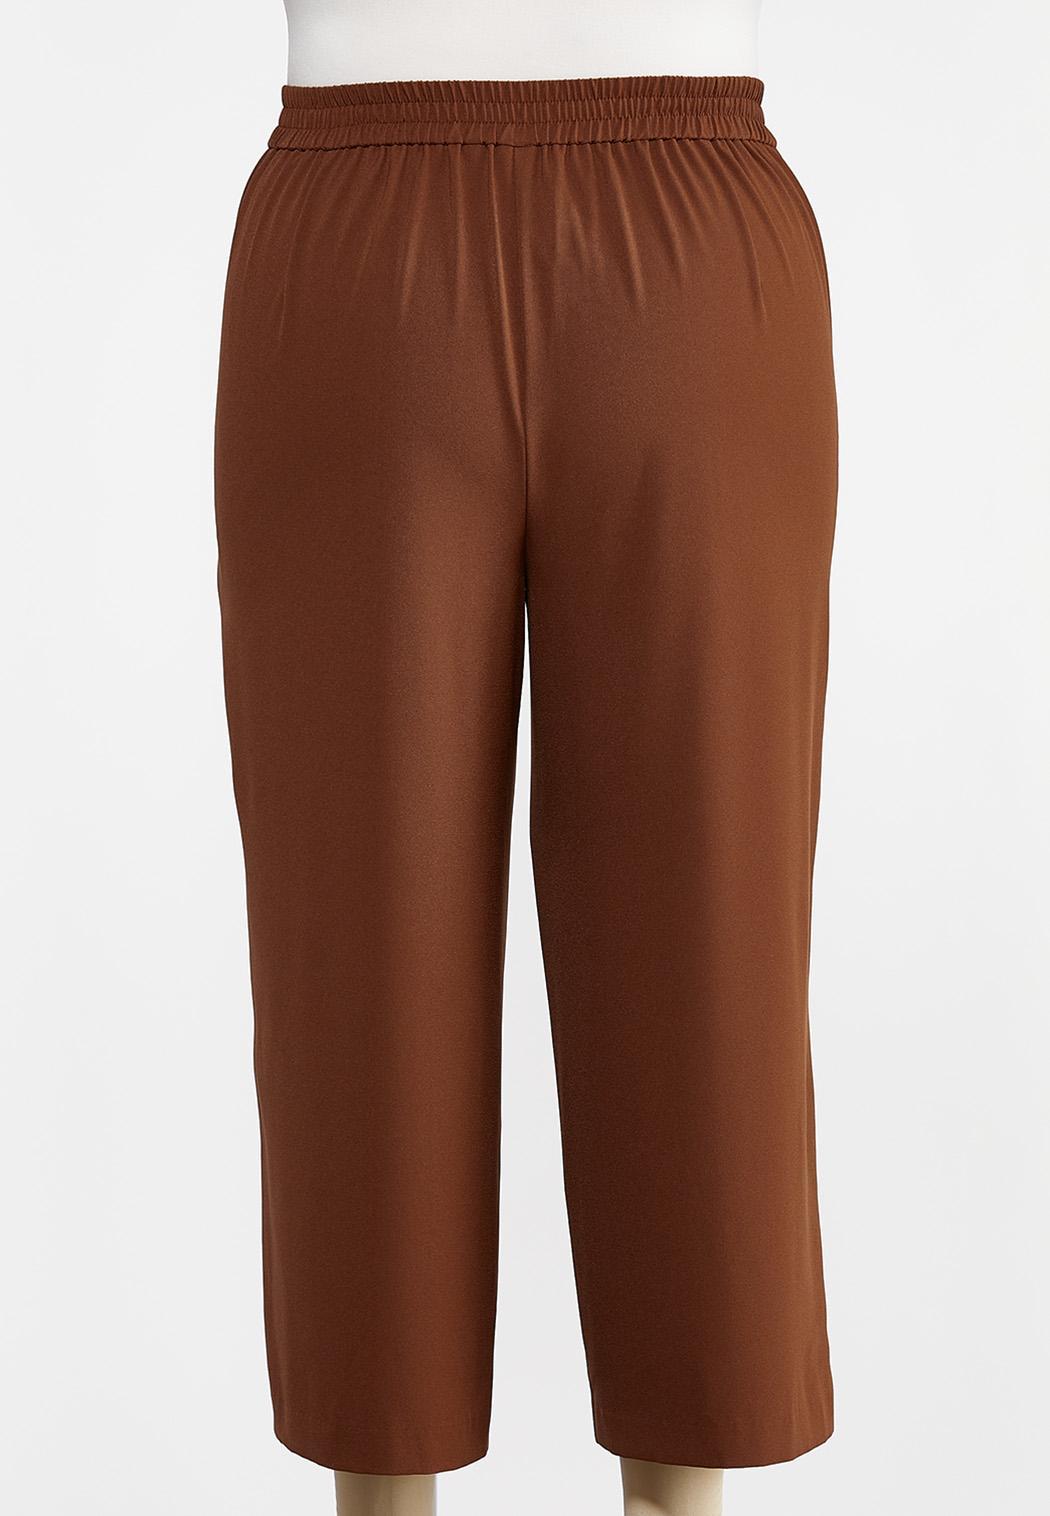 Plus Size Cropped Button Front Pants (Item #44292607)